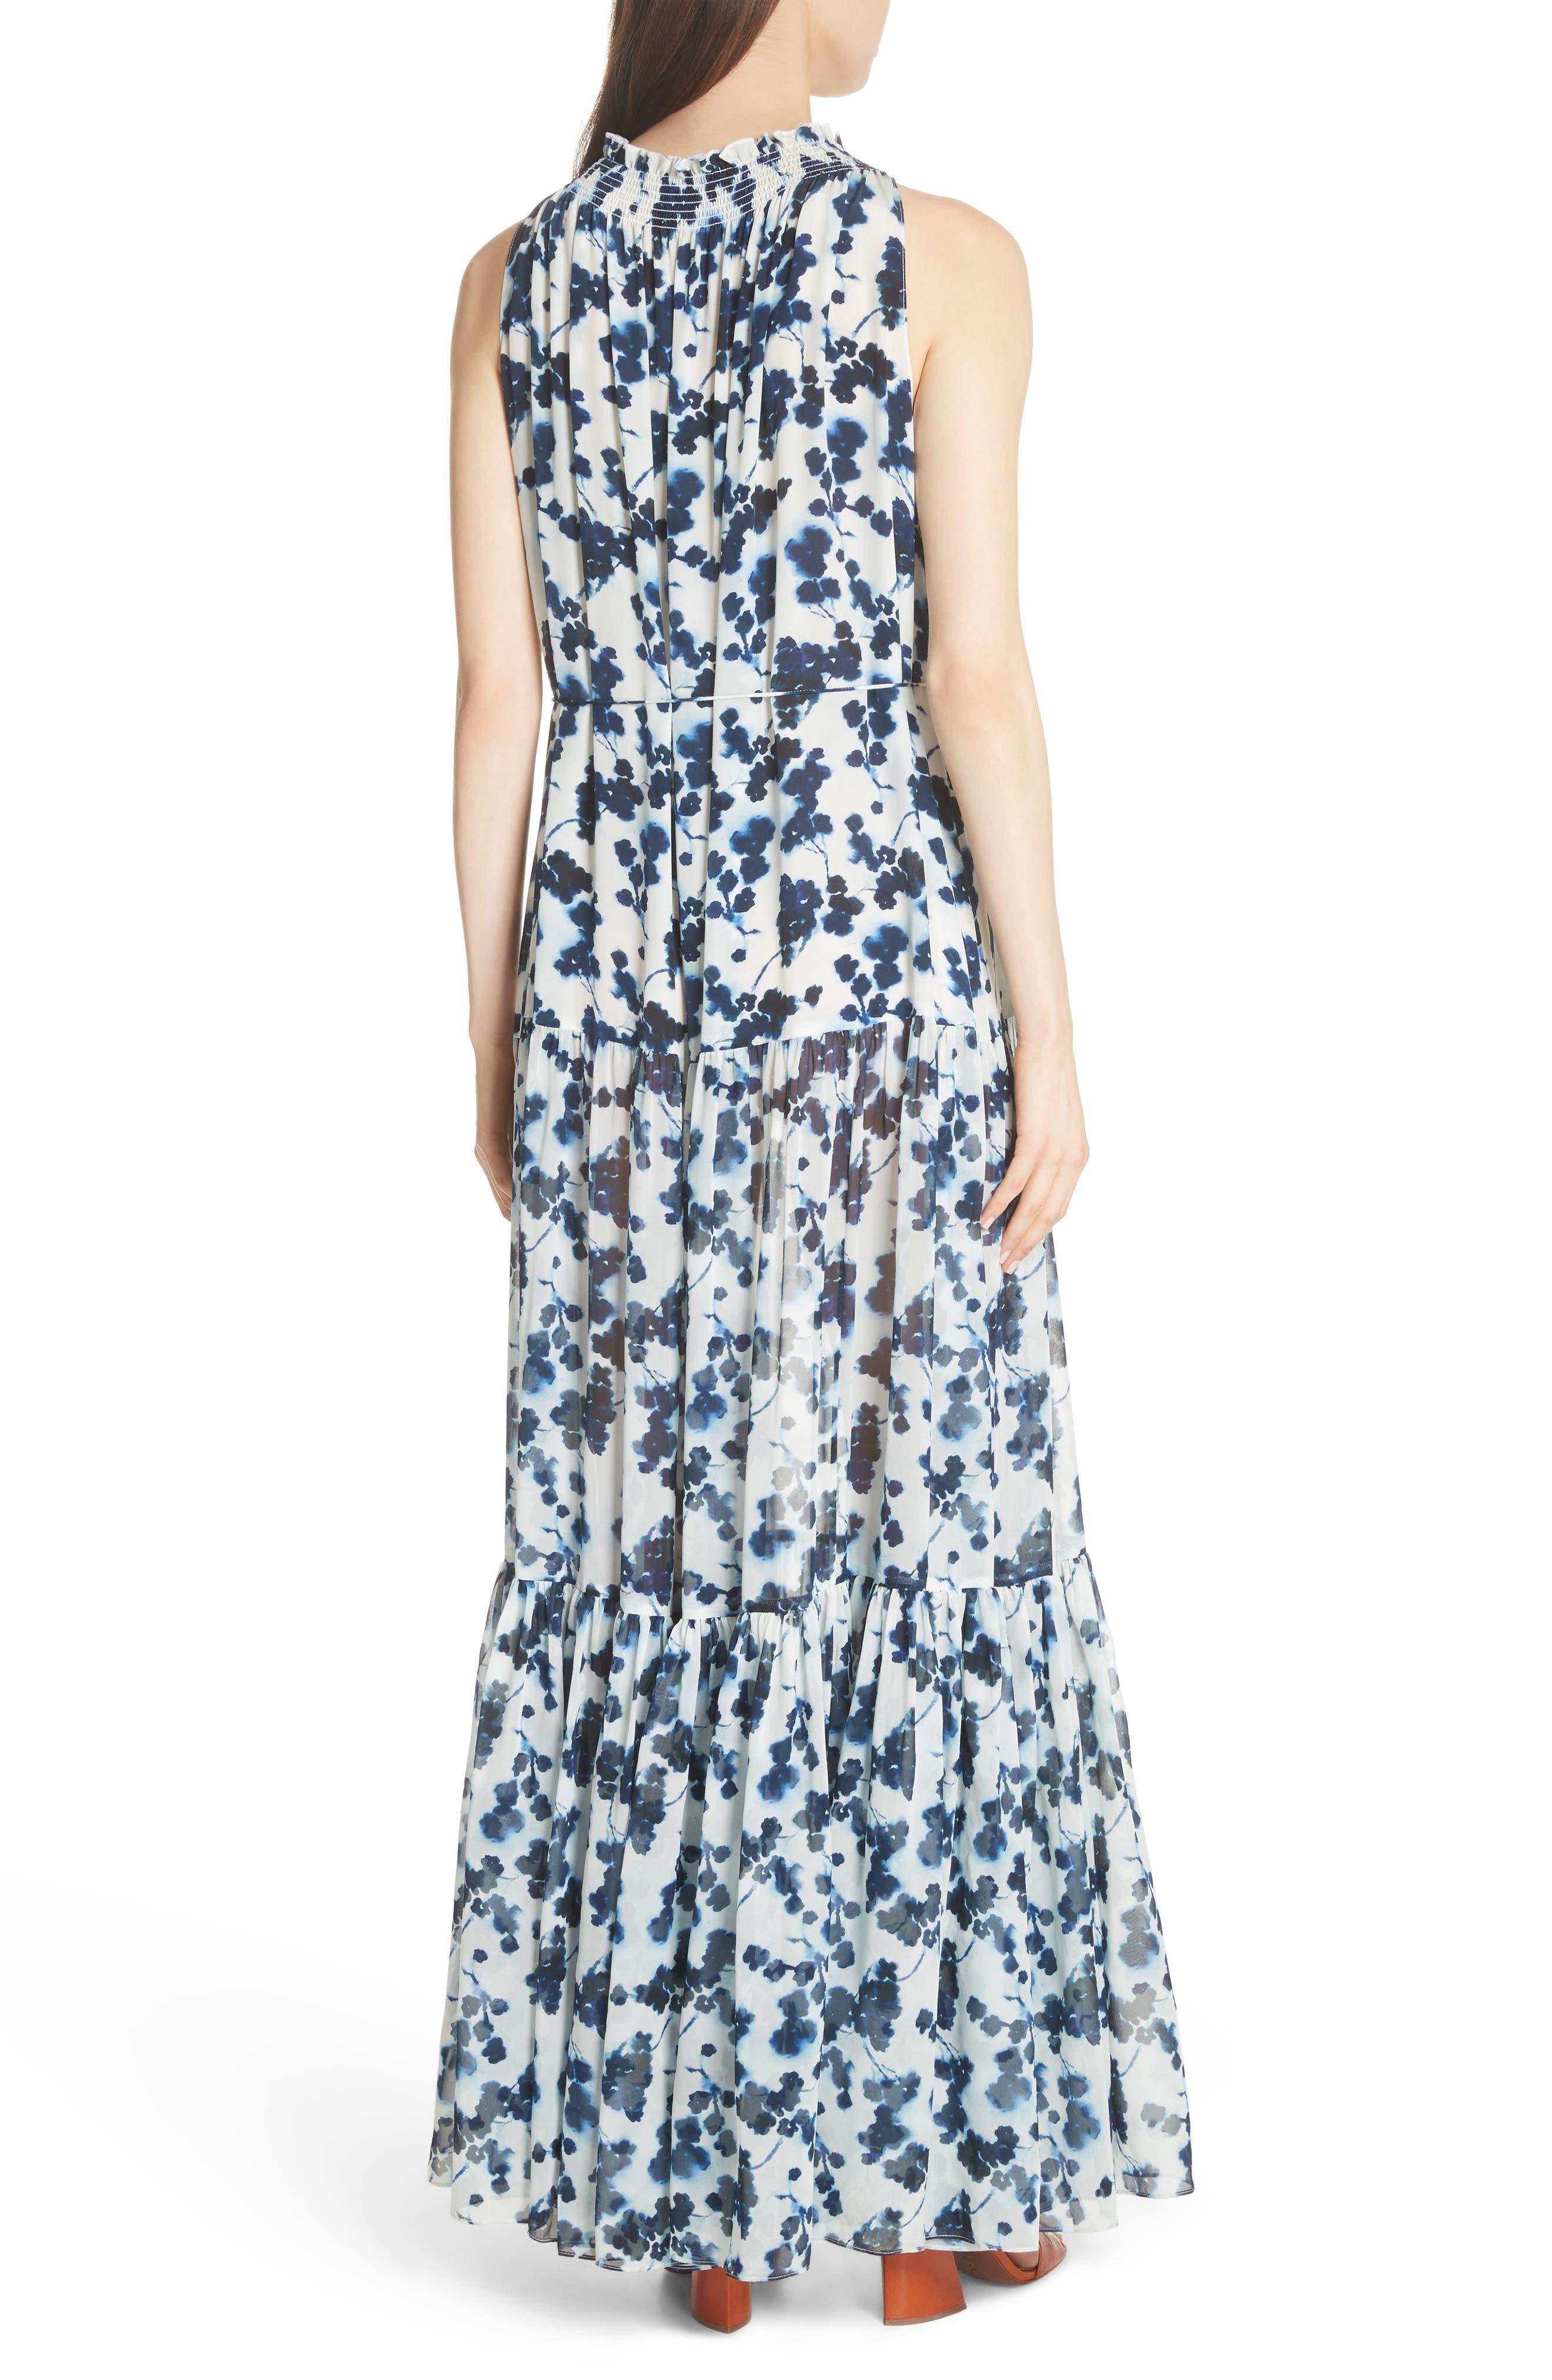 Lani P Floral Print Silk Dress,                             Alternate thumbnail 2, color,                             426